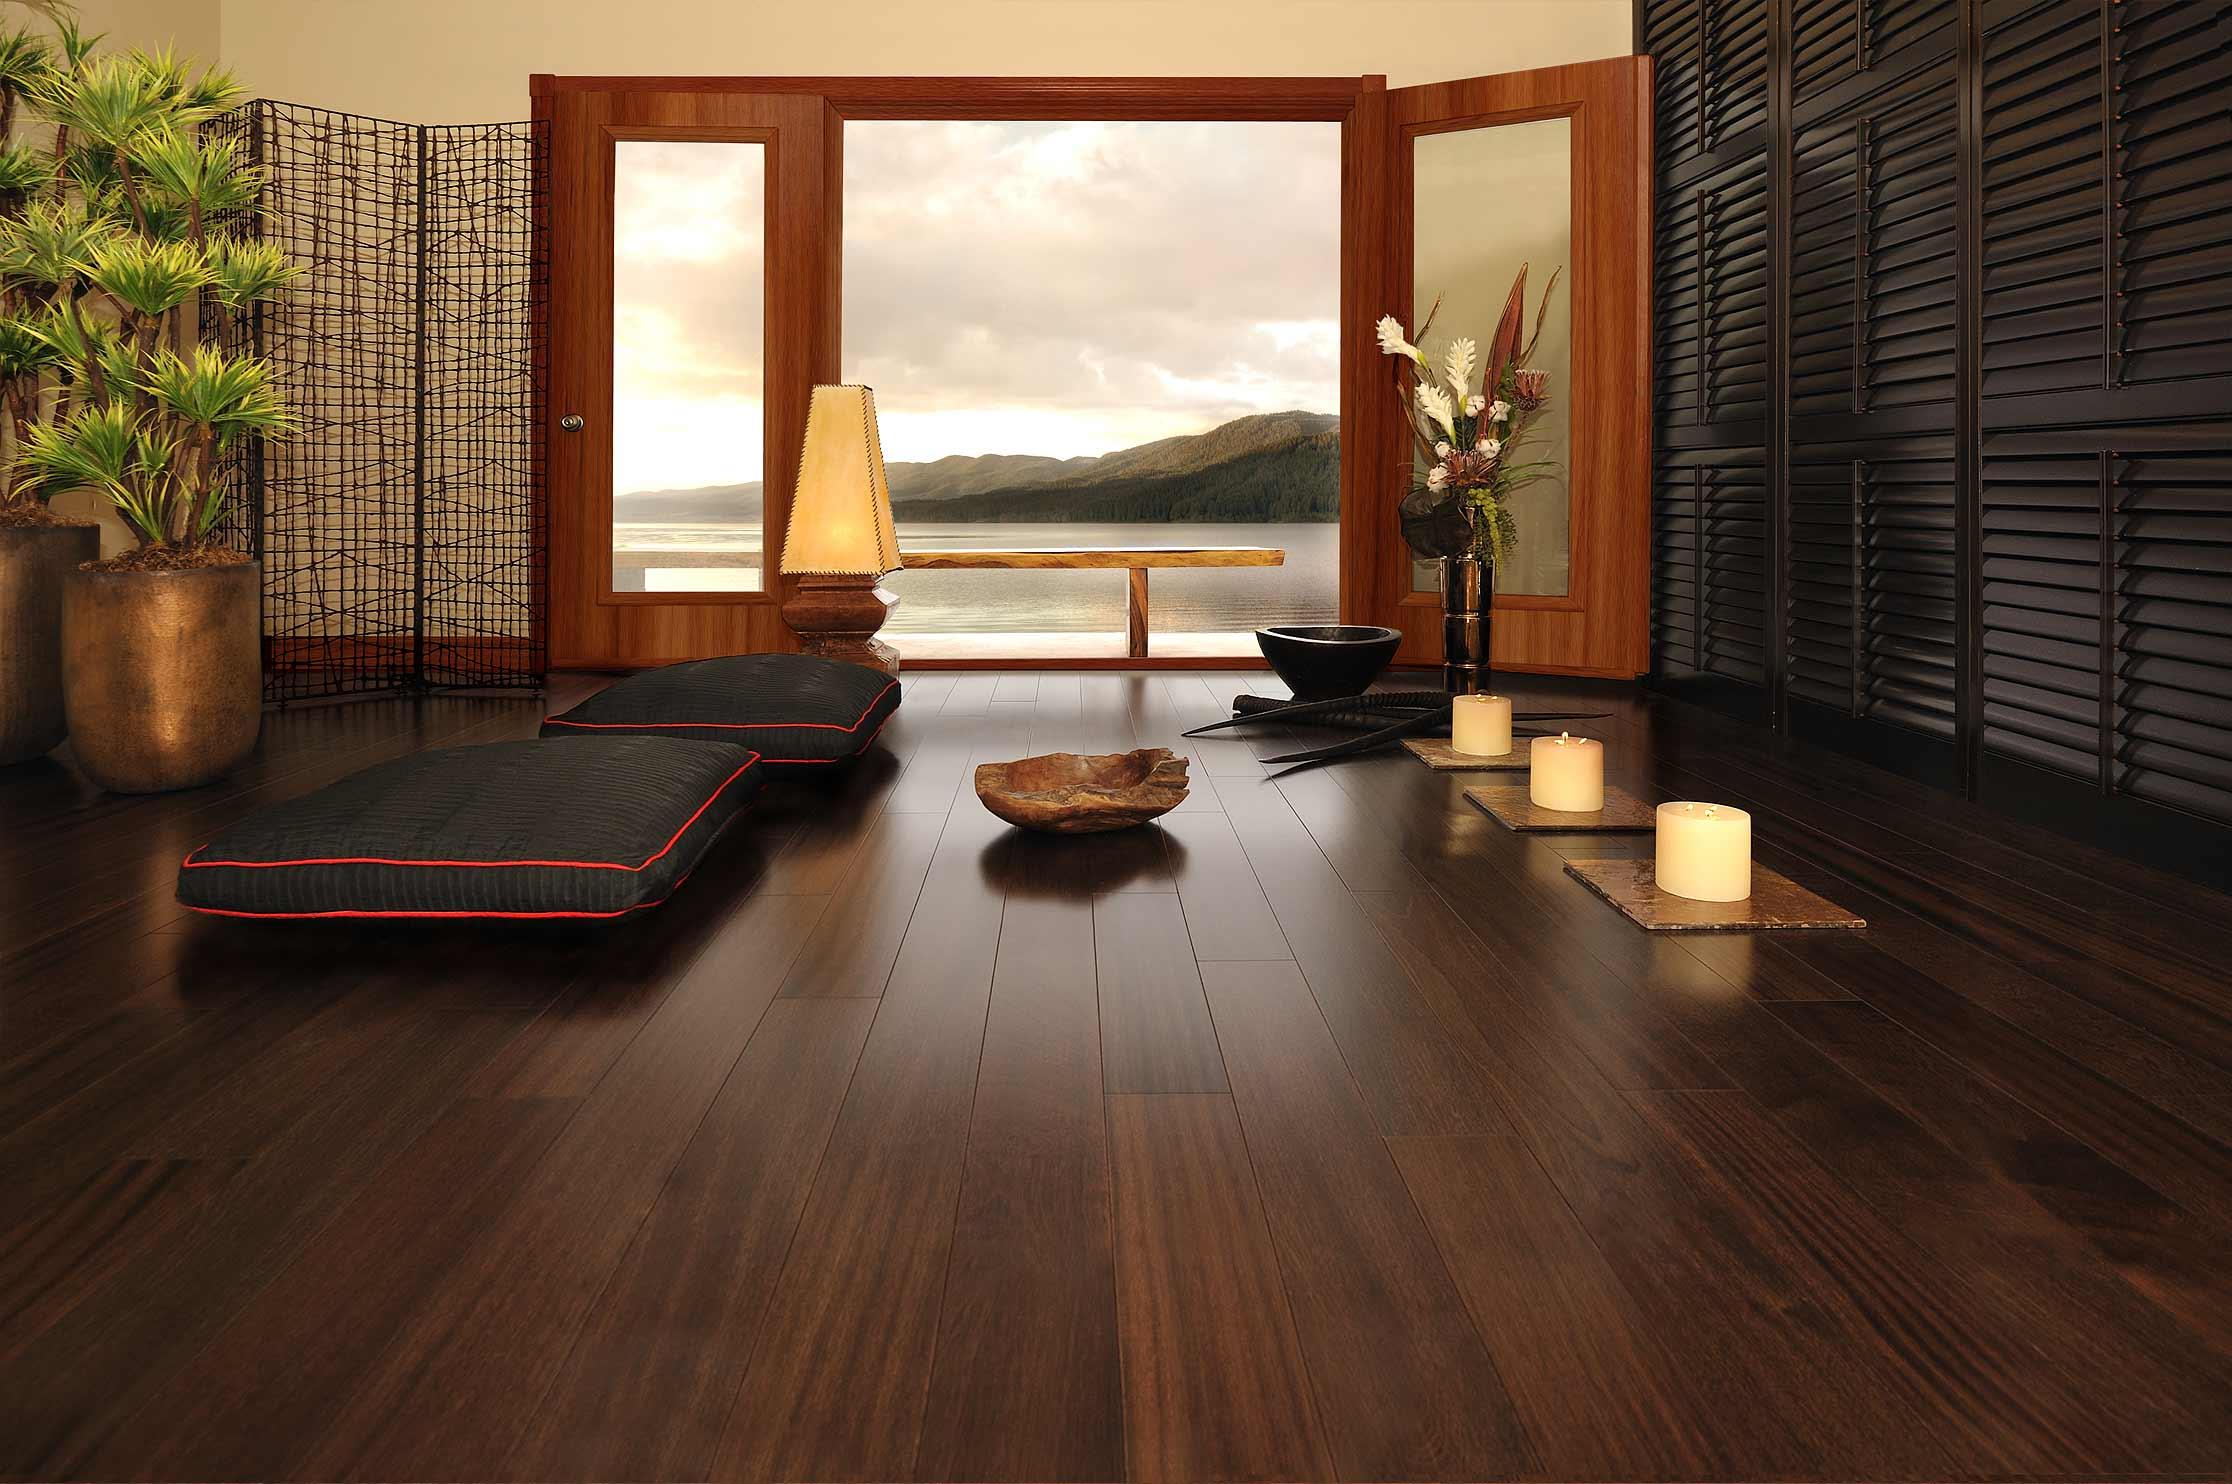 hardwood floors in bedroom home decorating wood flooring lighting RBECPXB